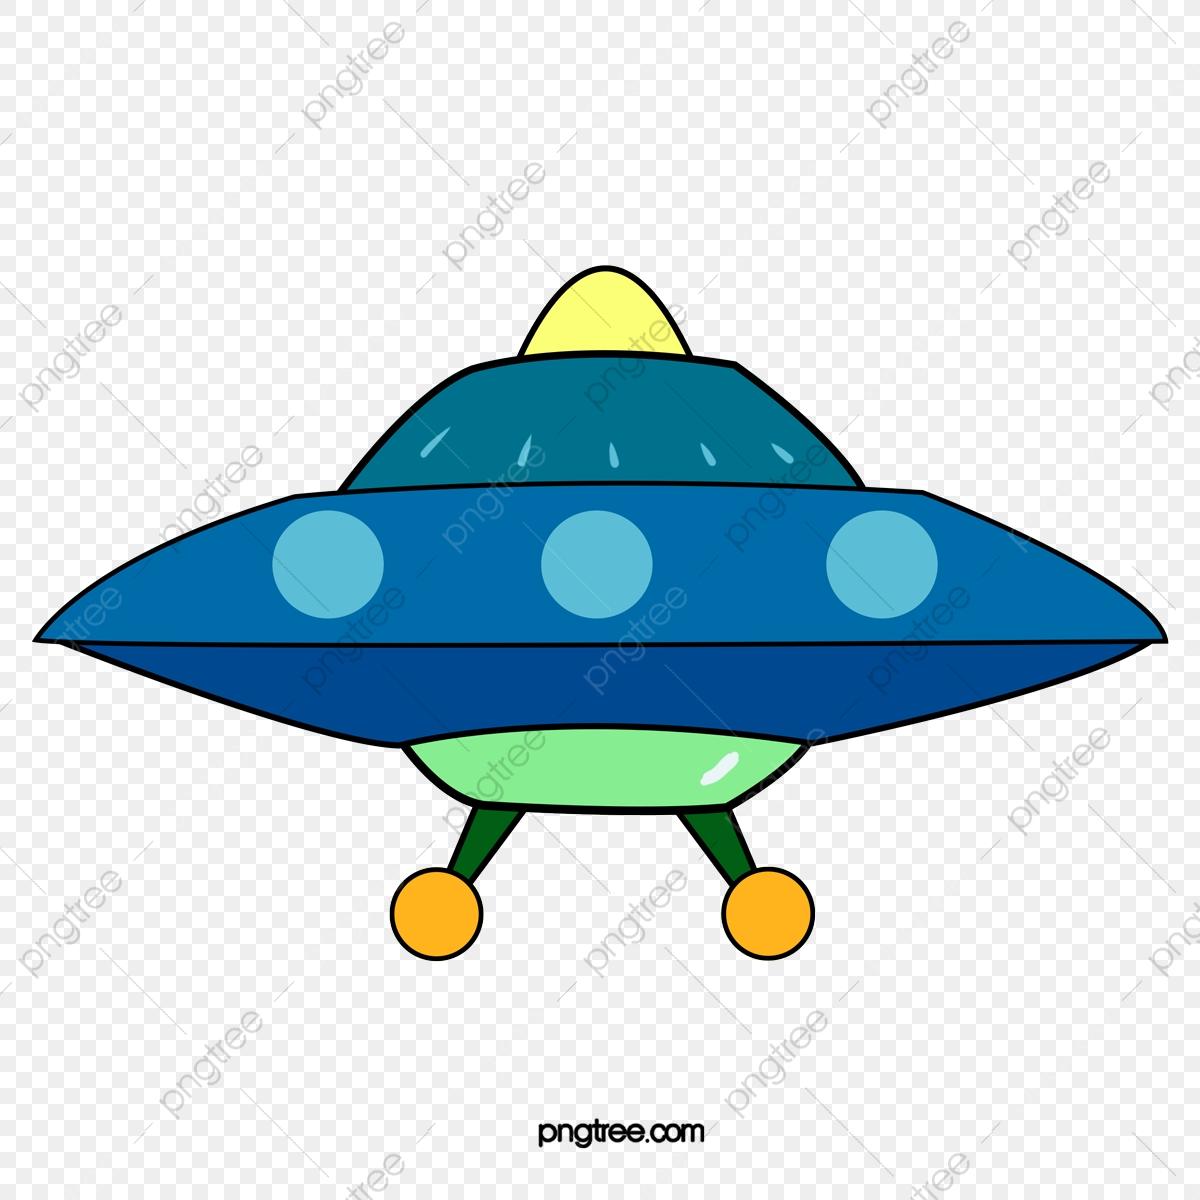 Spaceship, Ufo, Spaceship Clipart PNG Transparent Clipart.